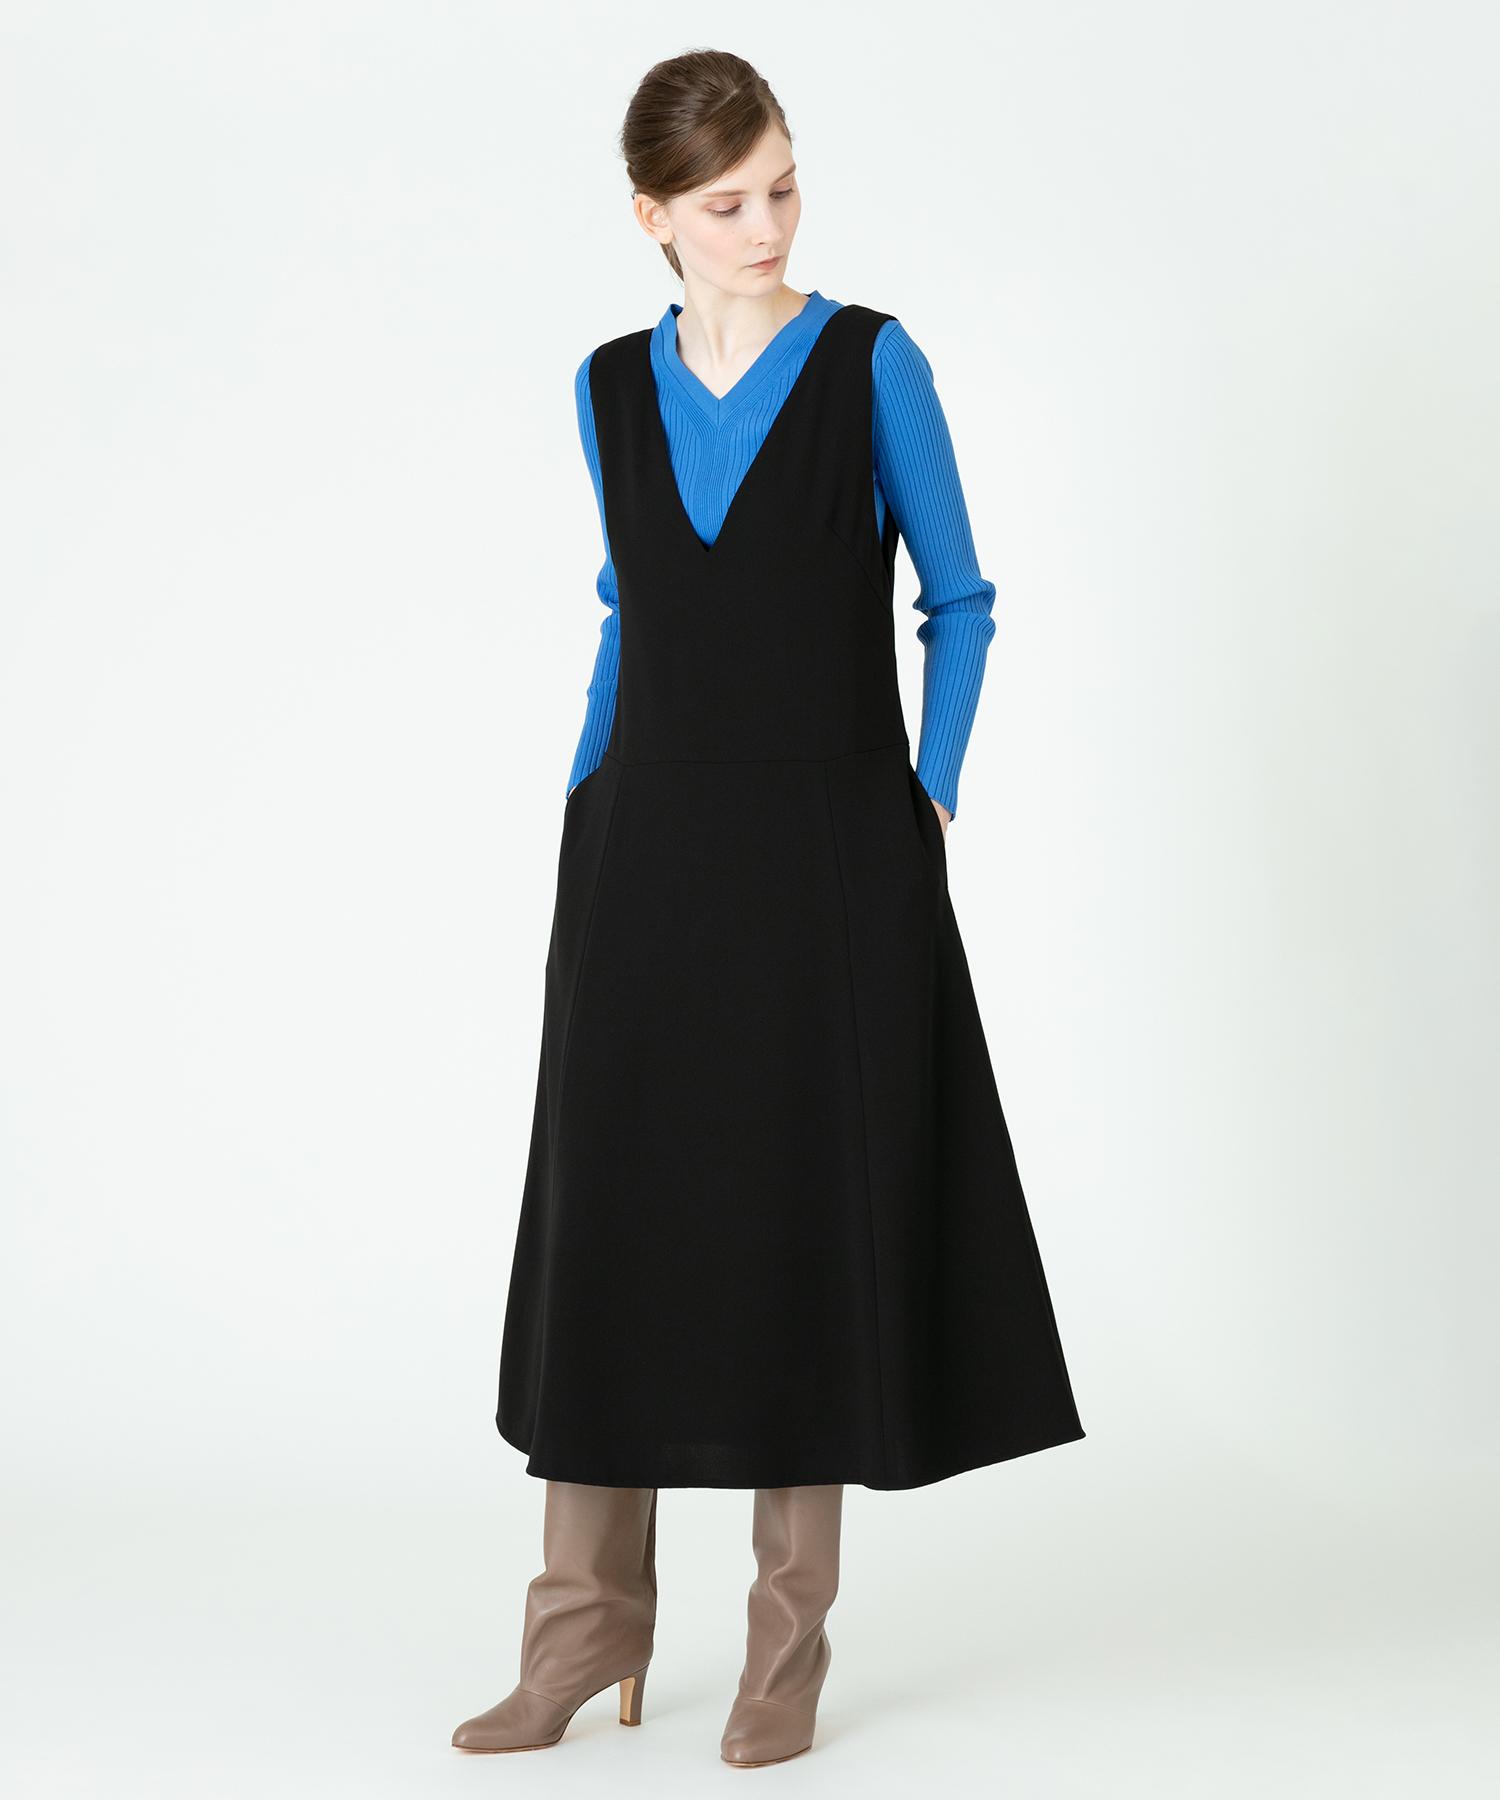 Vネックフレアジャンパースカート